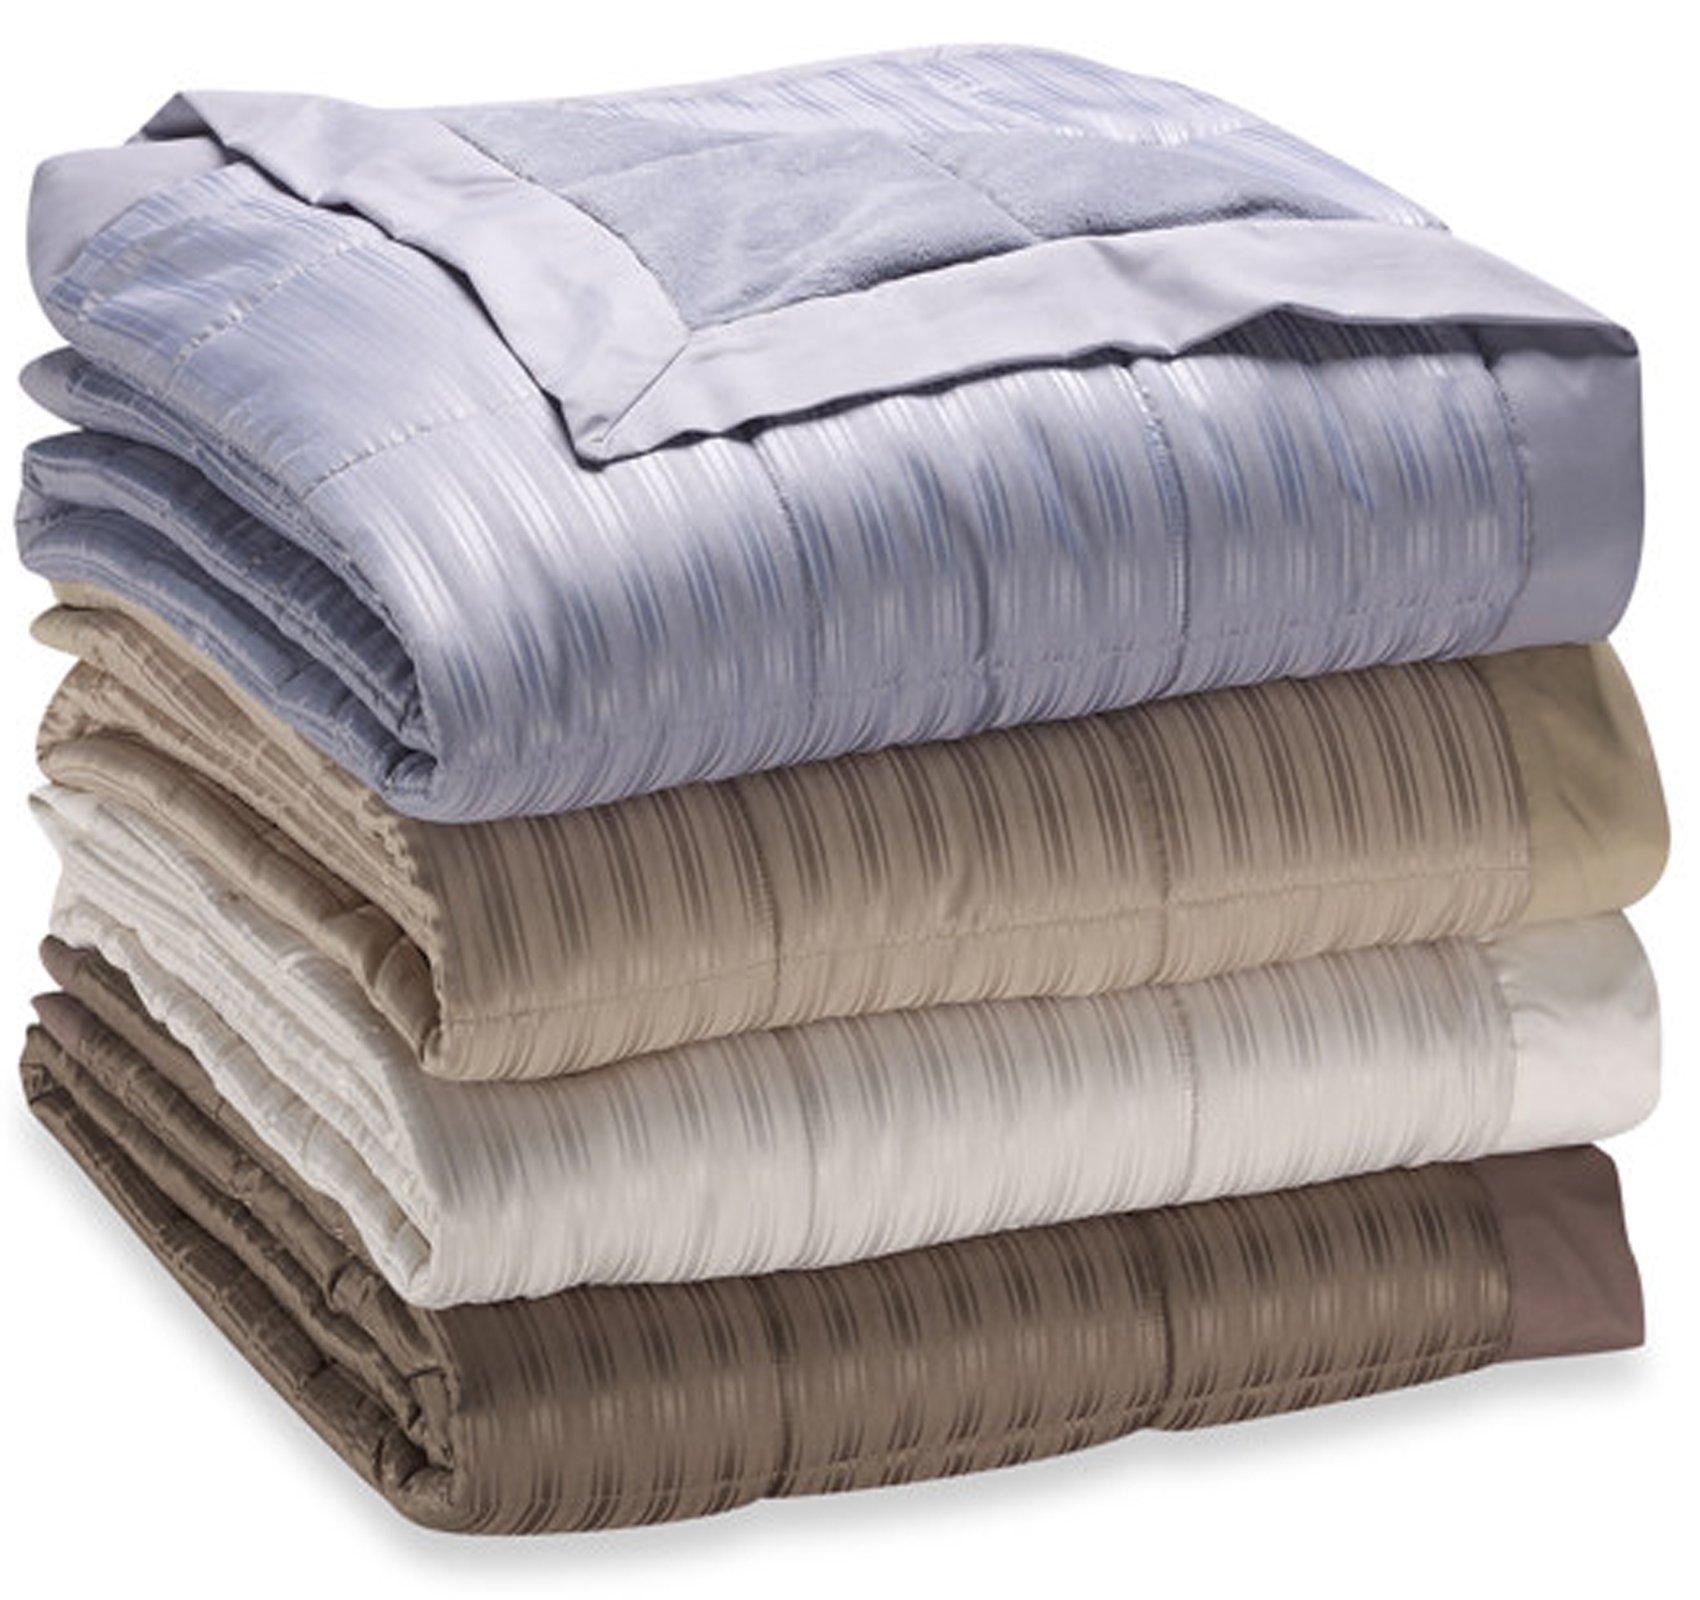 JBFF 250 Thread Count Microfiber Reverse to Fleece Goose Down Alternative Blanket, King, Khaki